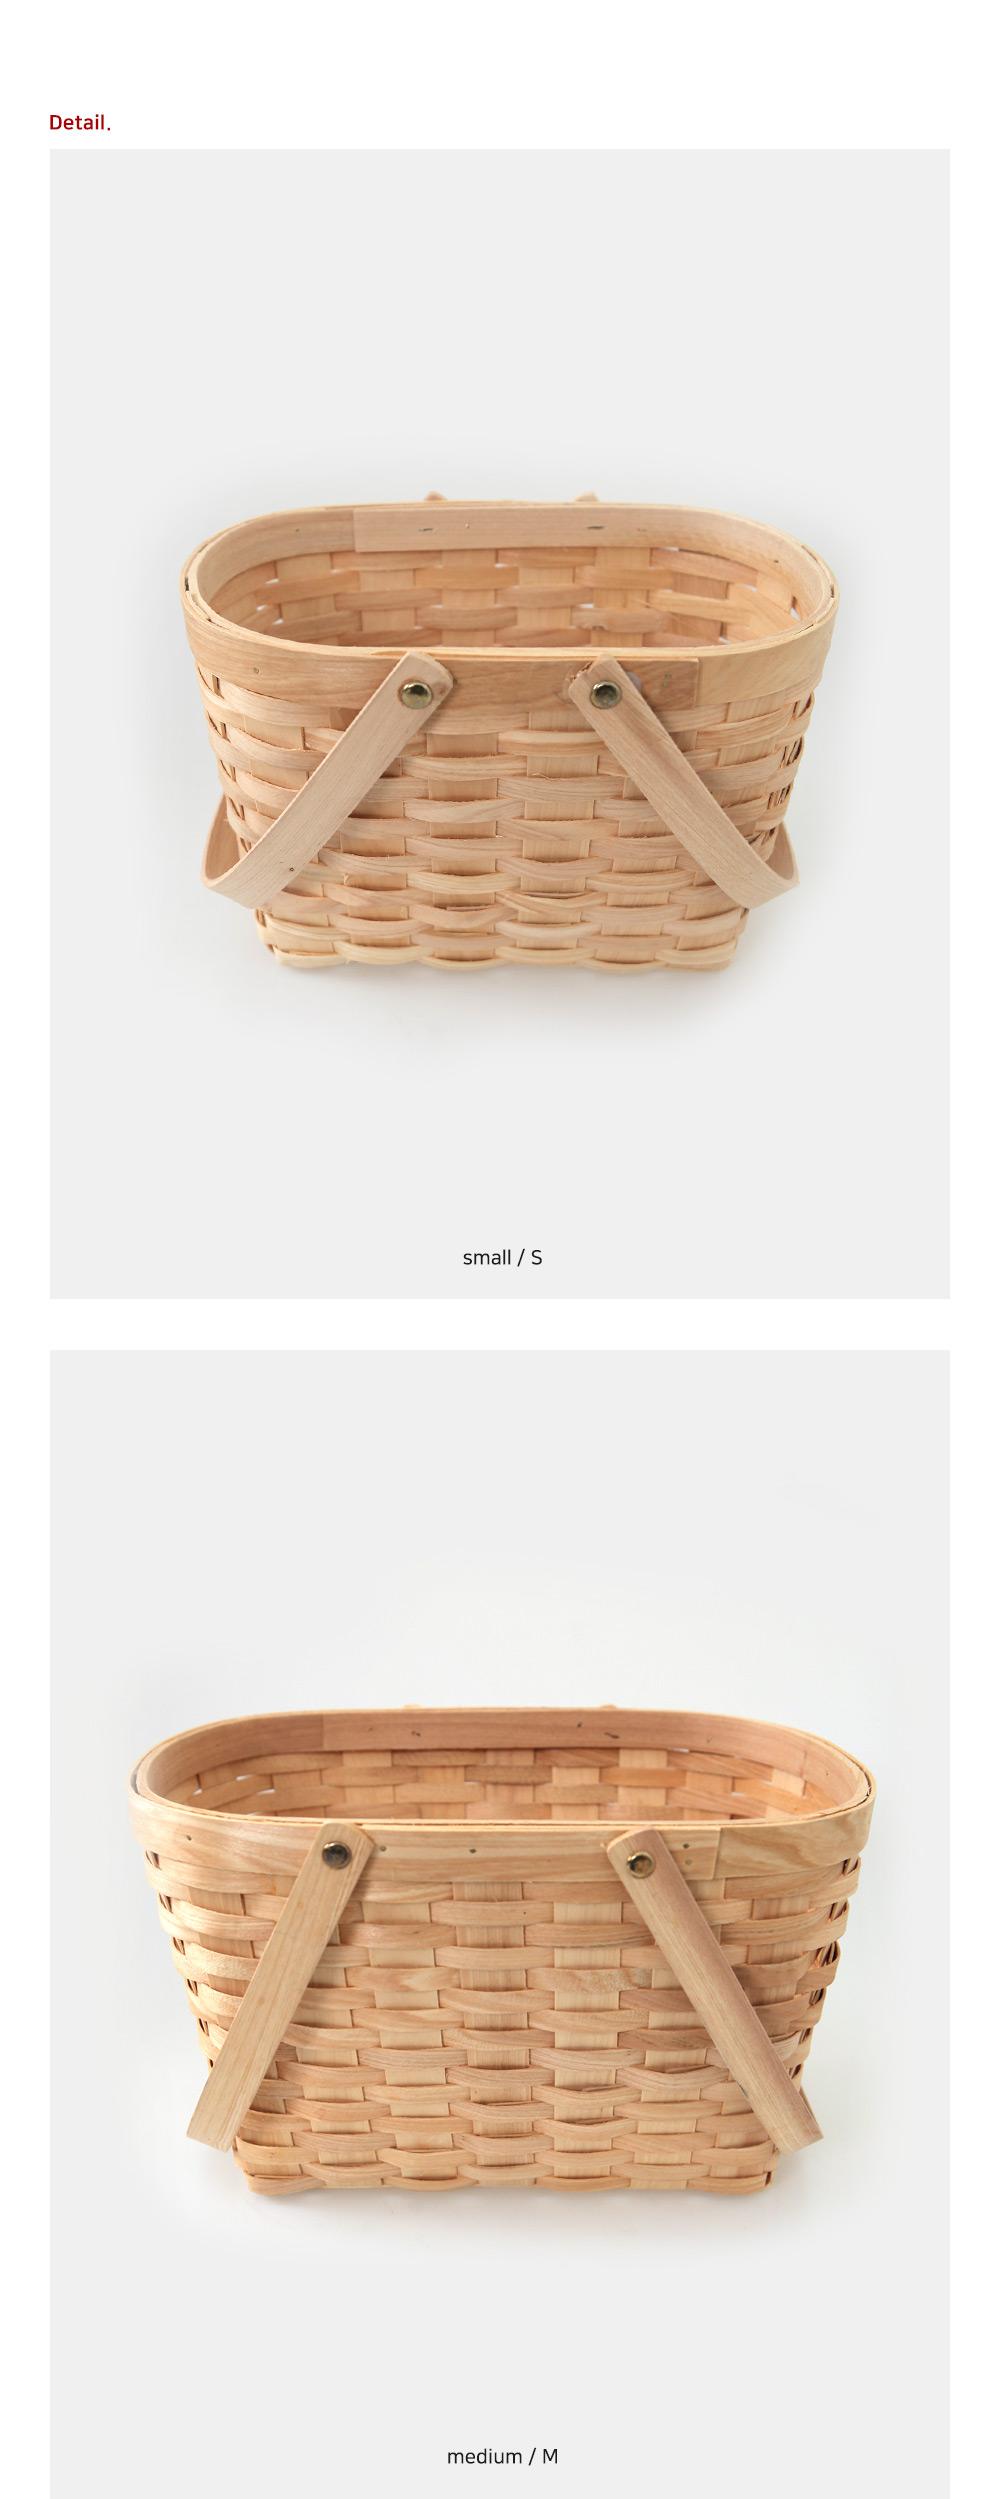 Light picnic basket